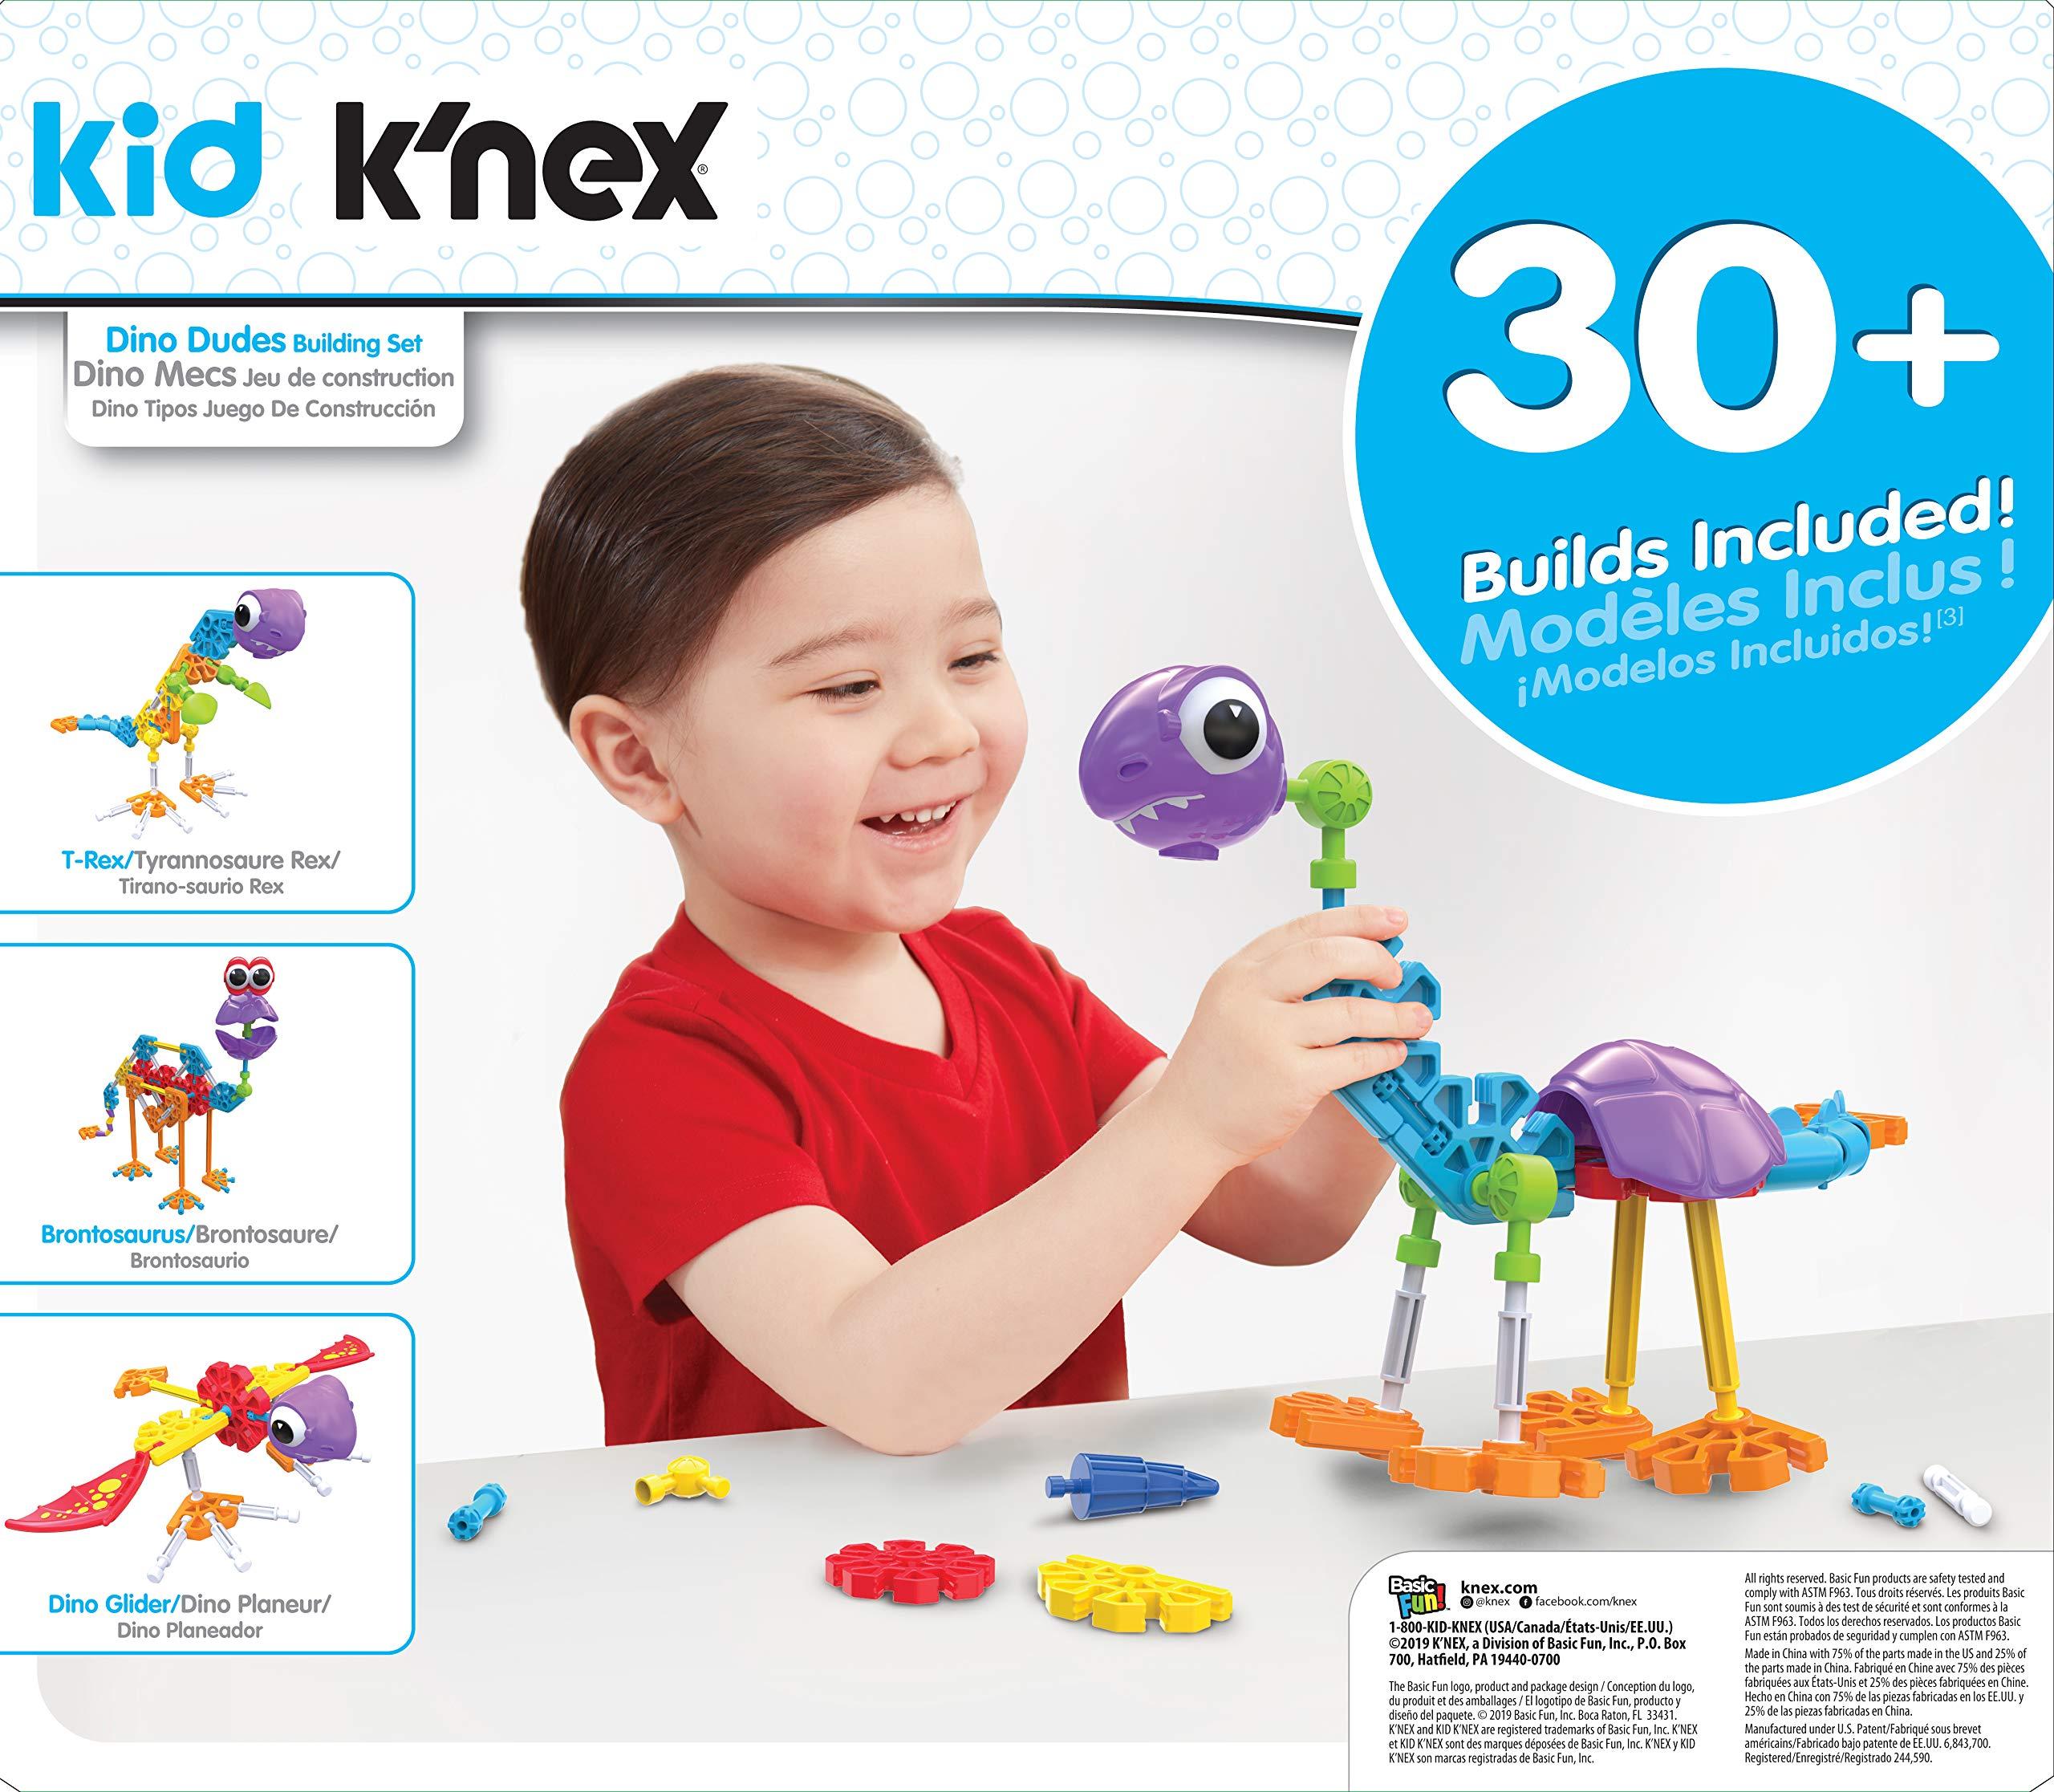 NEW KID K /'NEX DINO DUDES Set di costruzione